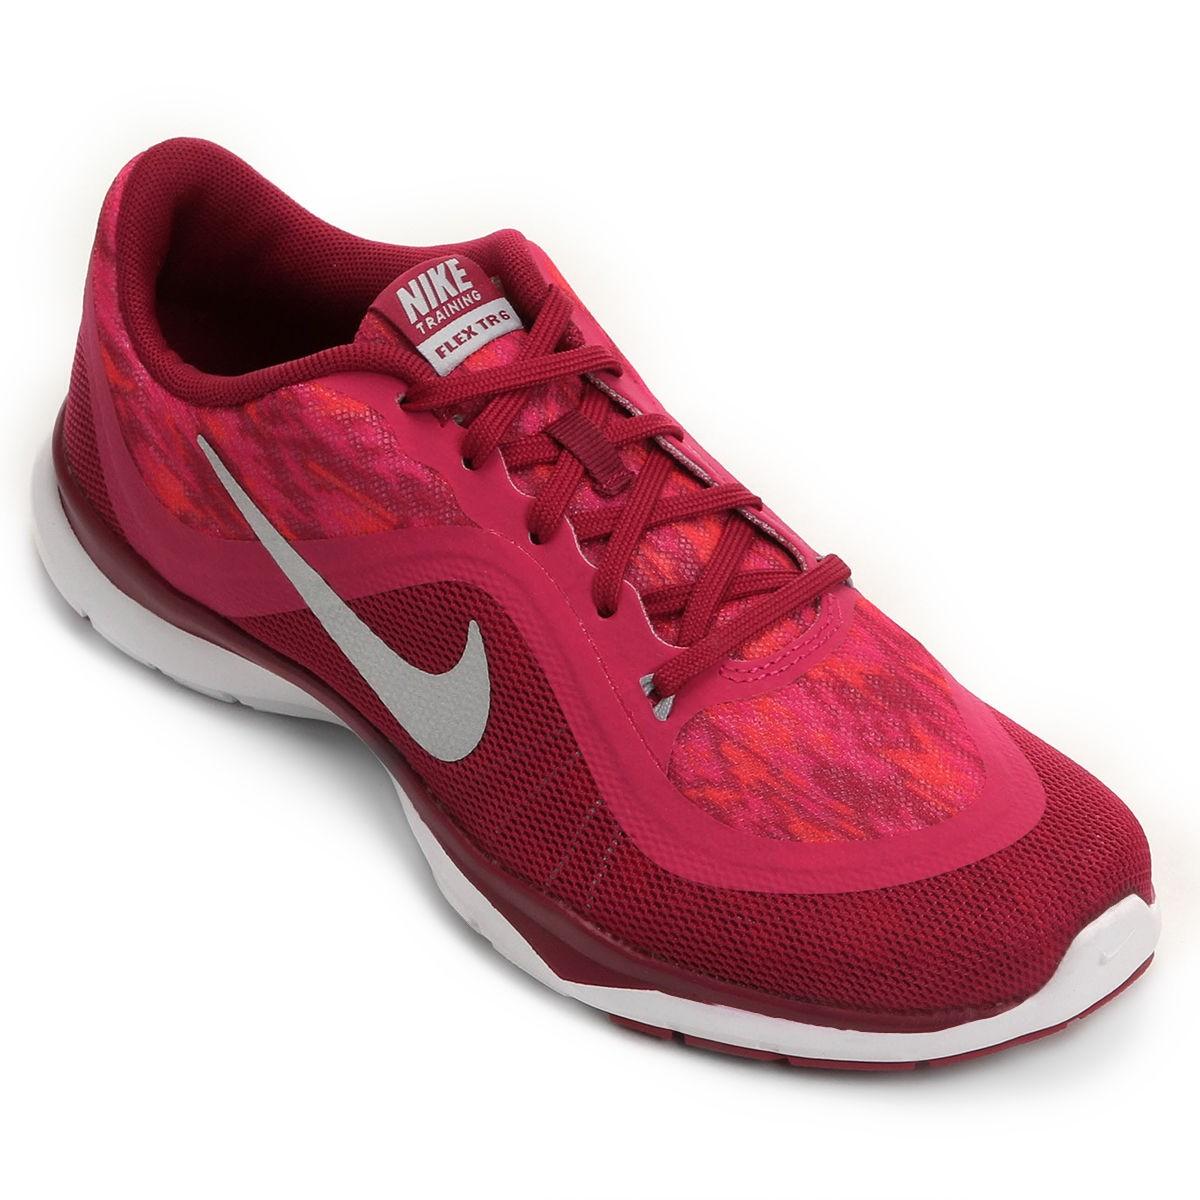 a46a838698 Nike - Página 6 - Busca na Joinville Sportcenter